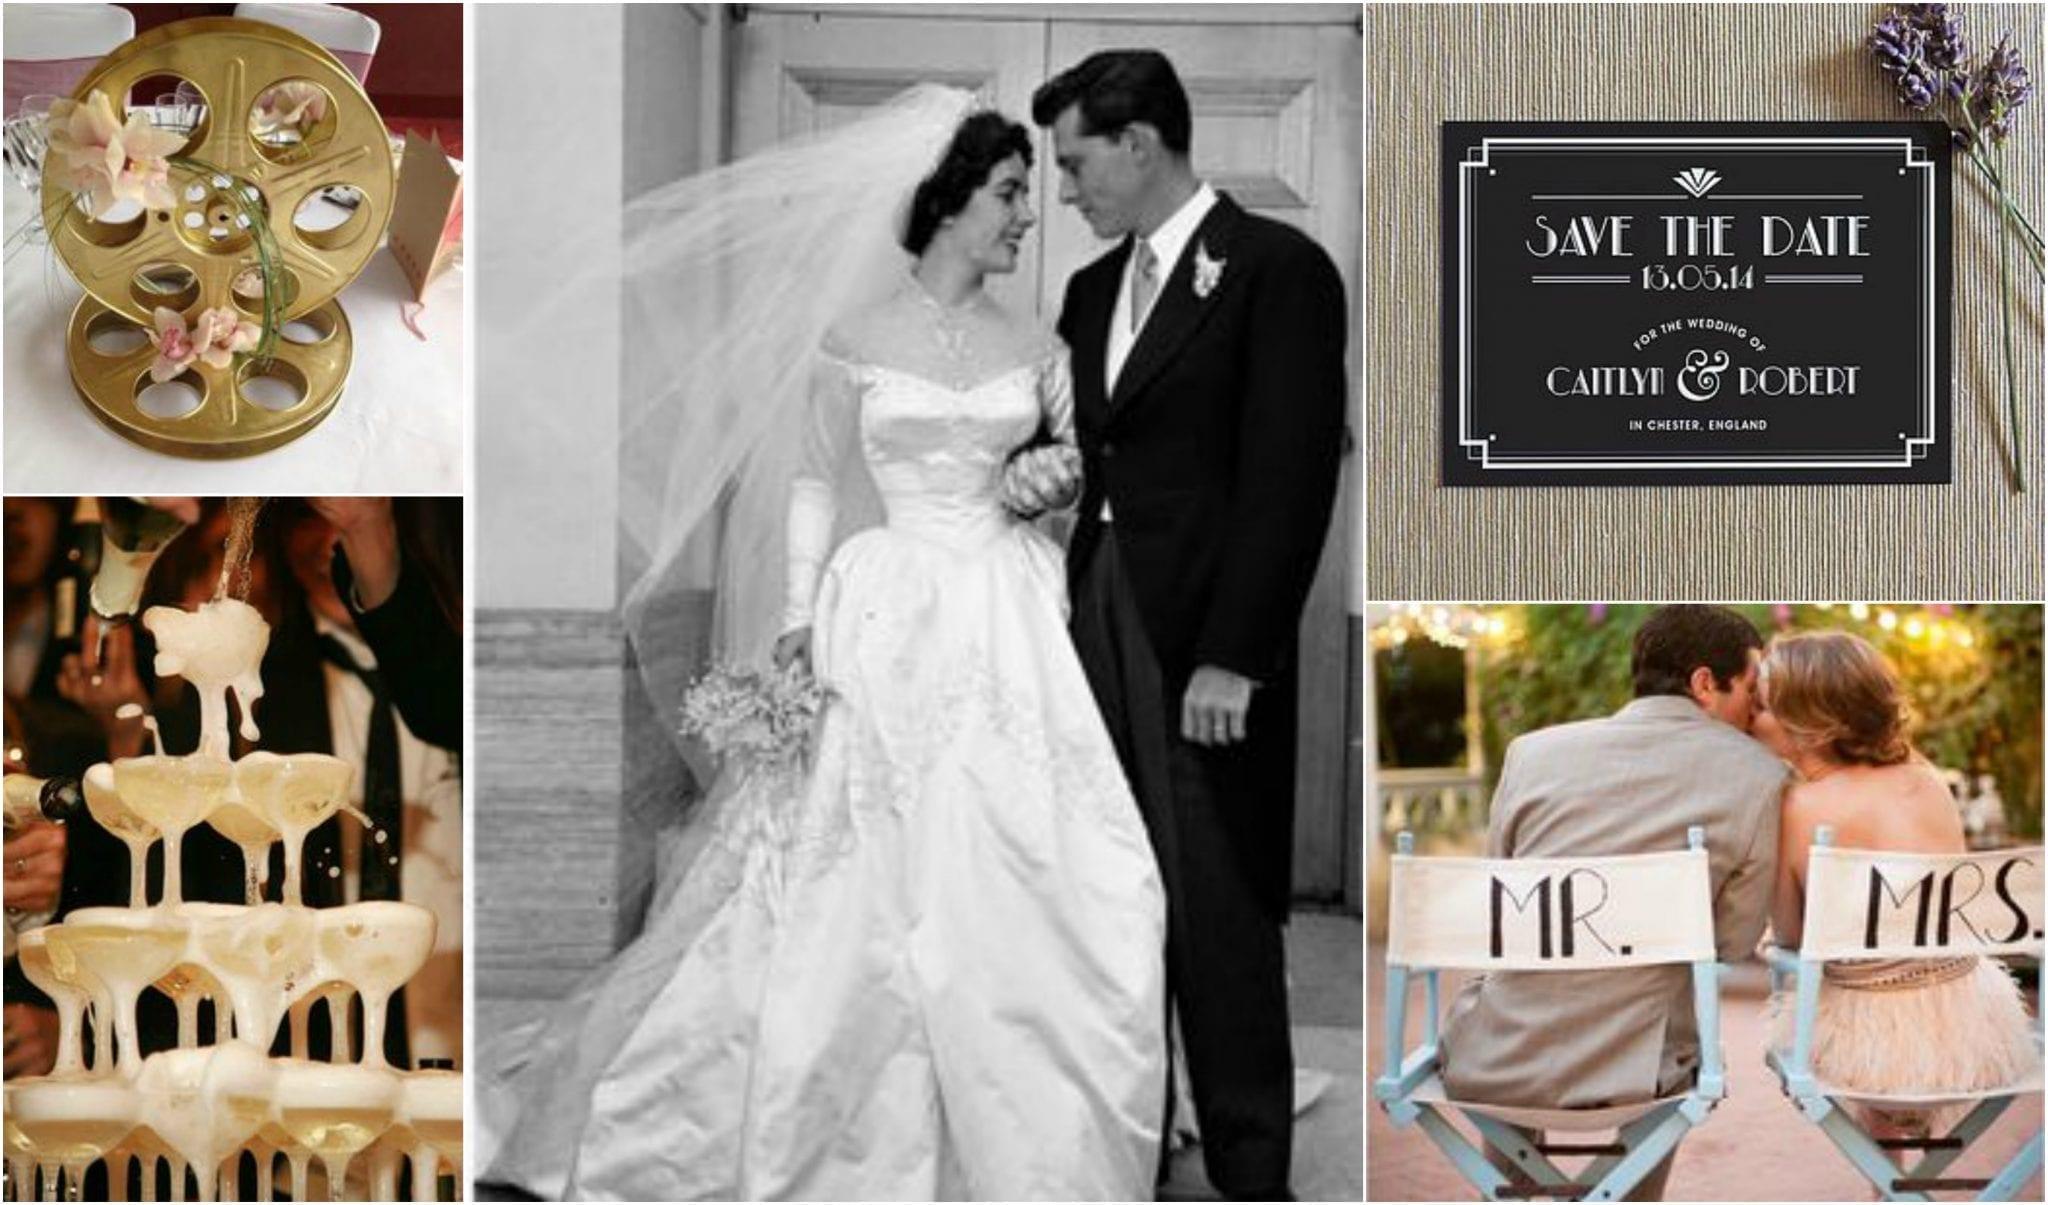 Hollywood Glamour wedding theme